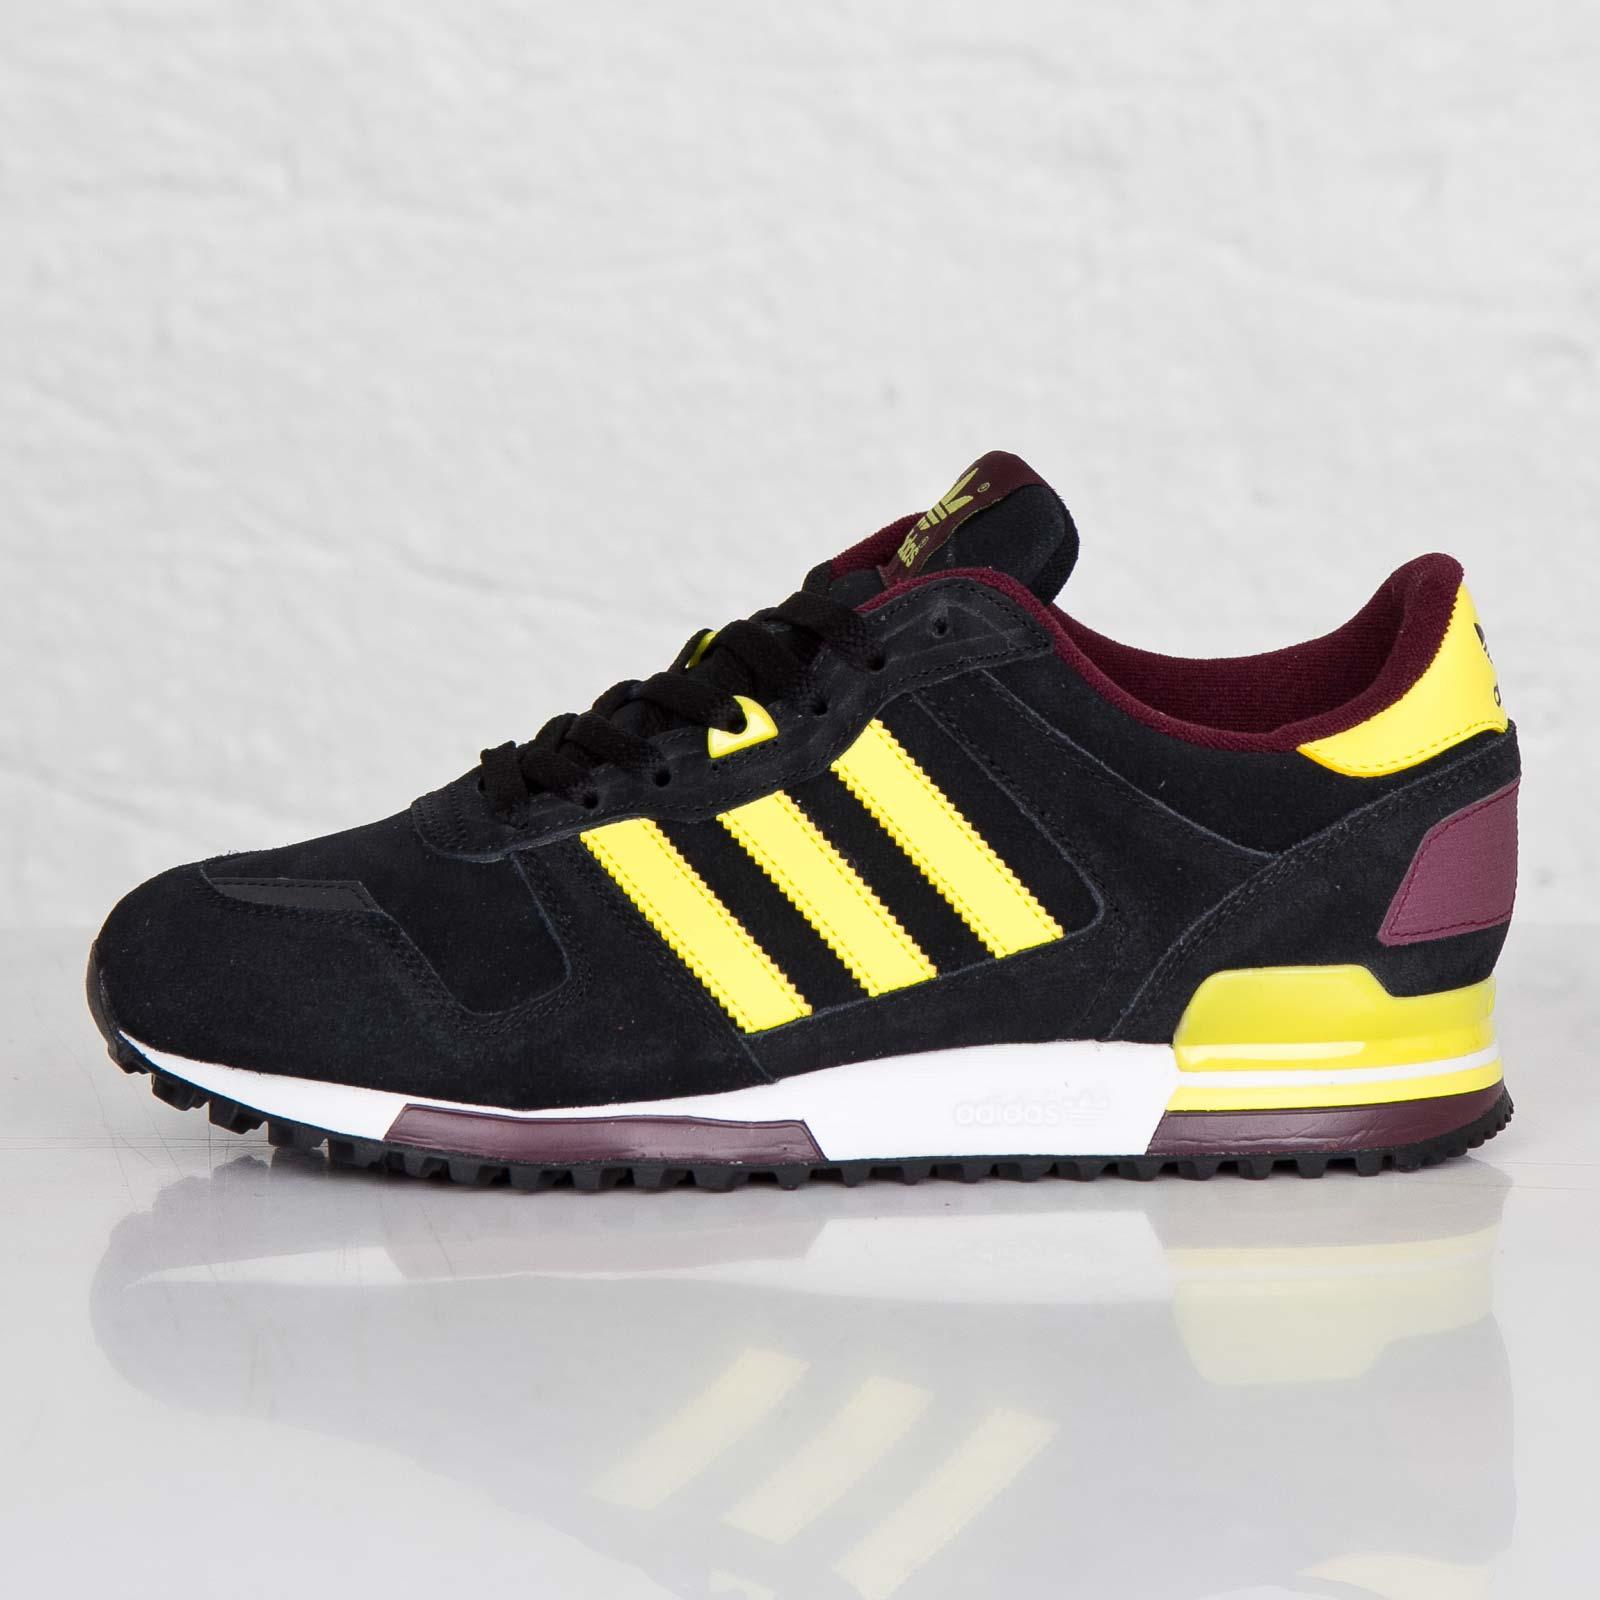 553df7a2ca1af adidas ZX 700 - M18254 - Sneakersnstuff